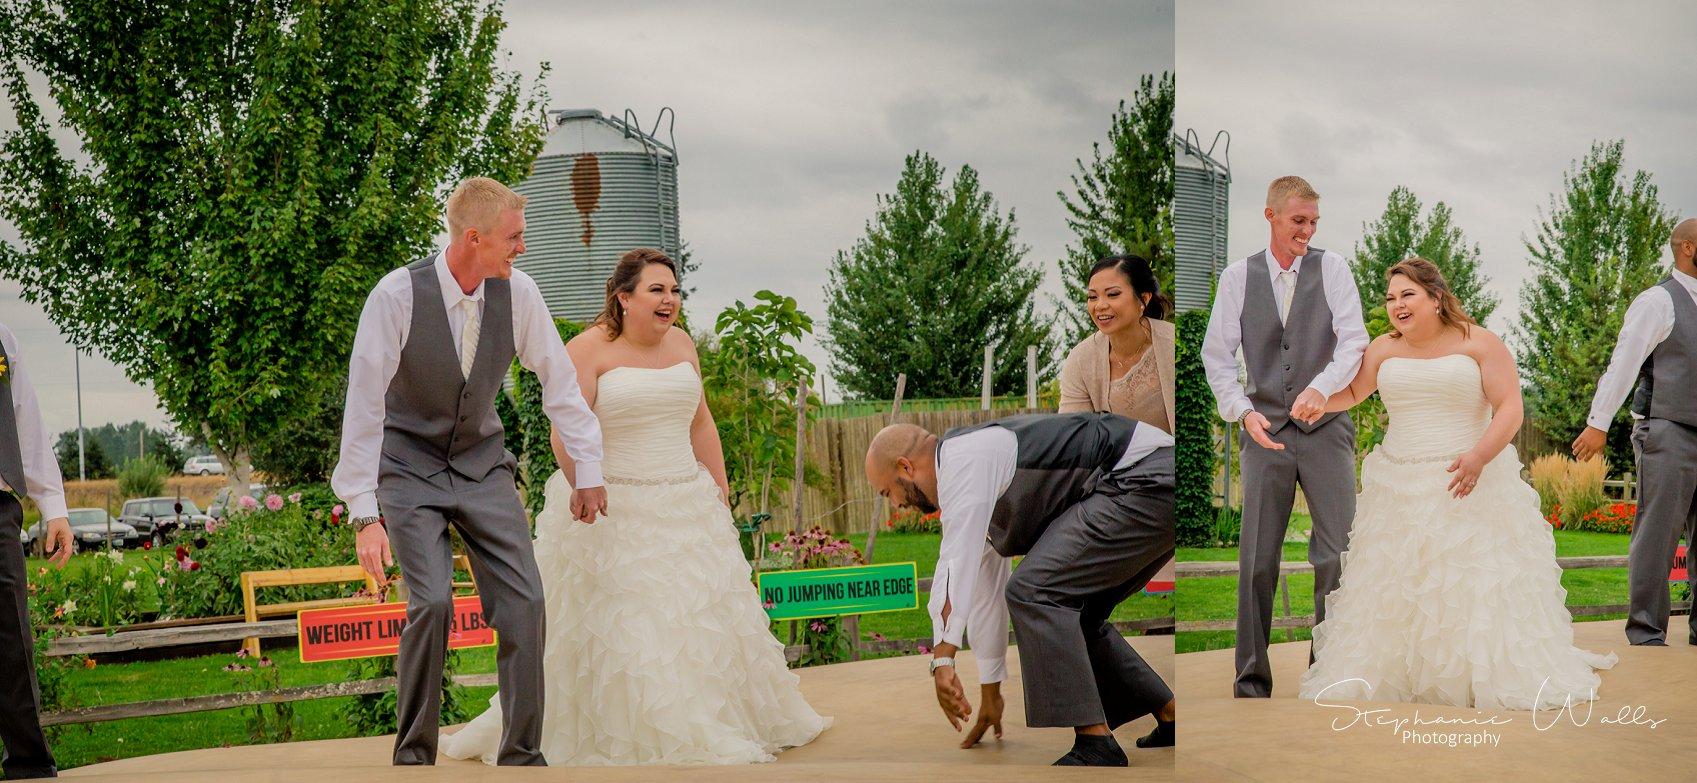 Kimble Wedding 085 Marlena & Allans | Snohomish Red Barn Events (Stocker Farms) | Snohomish, Wa Wedding Photographer